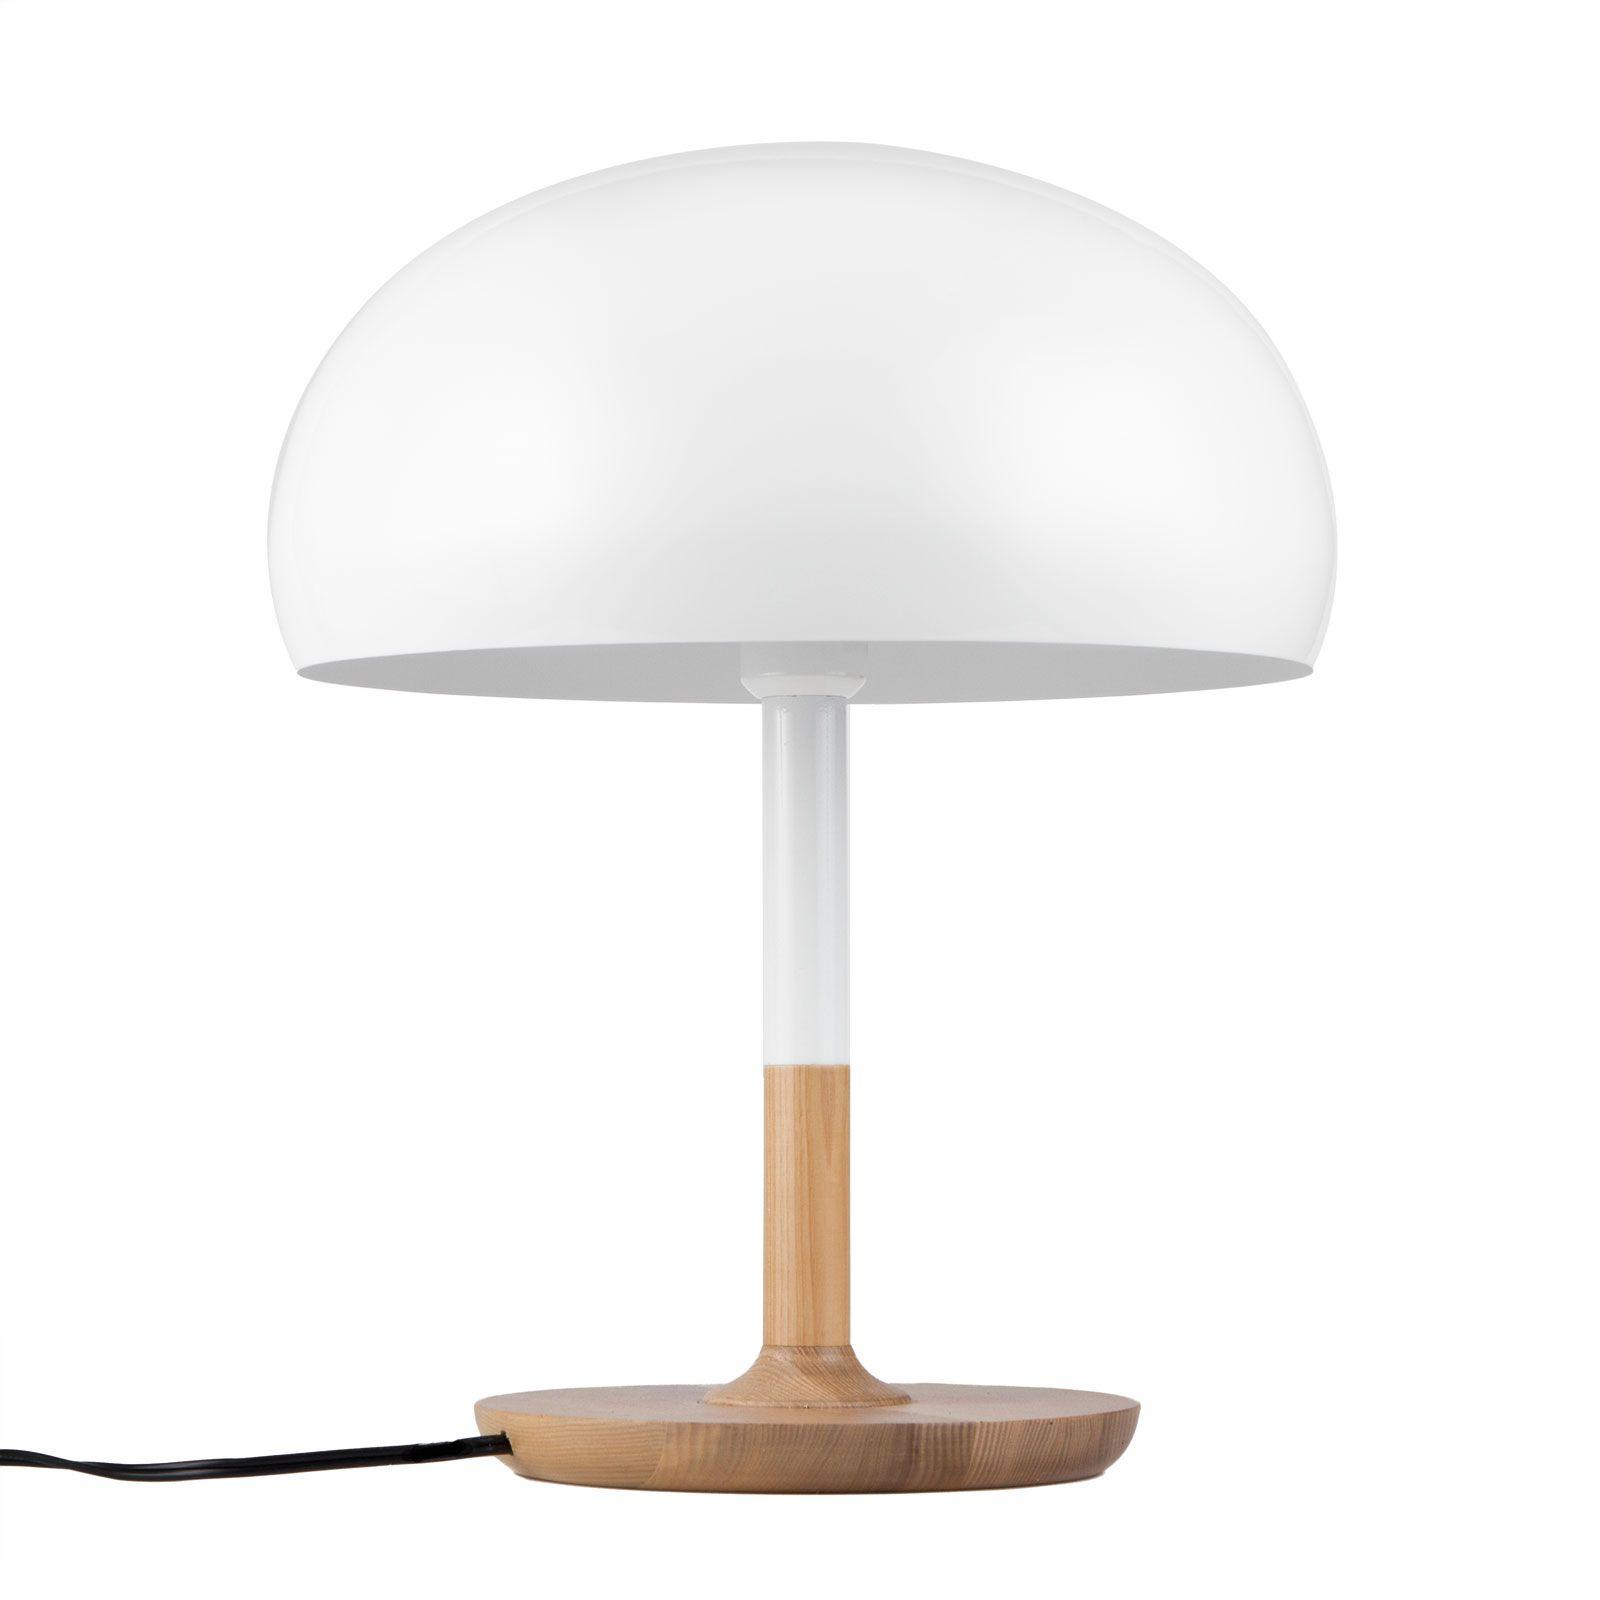 Superb Under The Dome Lamp   Unique Modern Furniture   Dot U0026 Bo